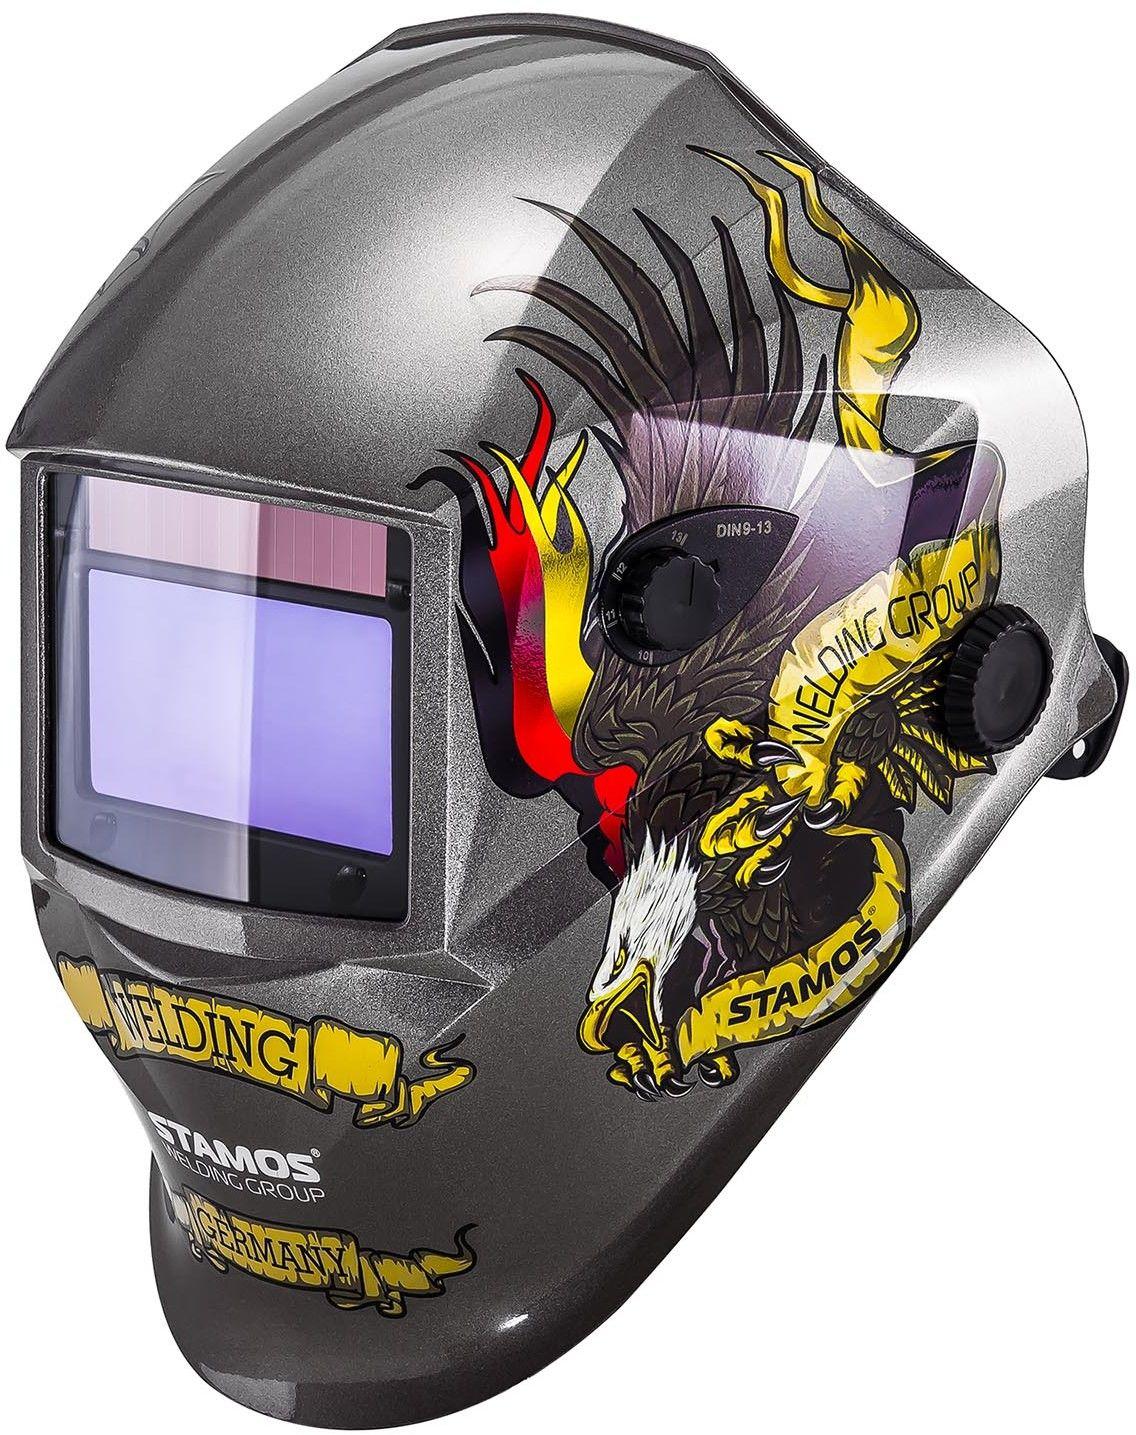 Maska spawalnicza - Eagle Eye - Advanced - Stamos Germany - Eagle Eye - 3 lata gwarancji/wysyłka w 24h